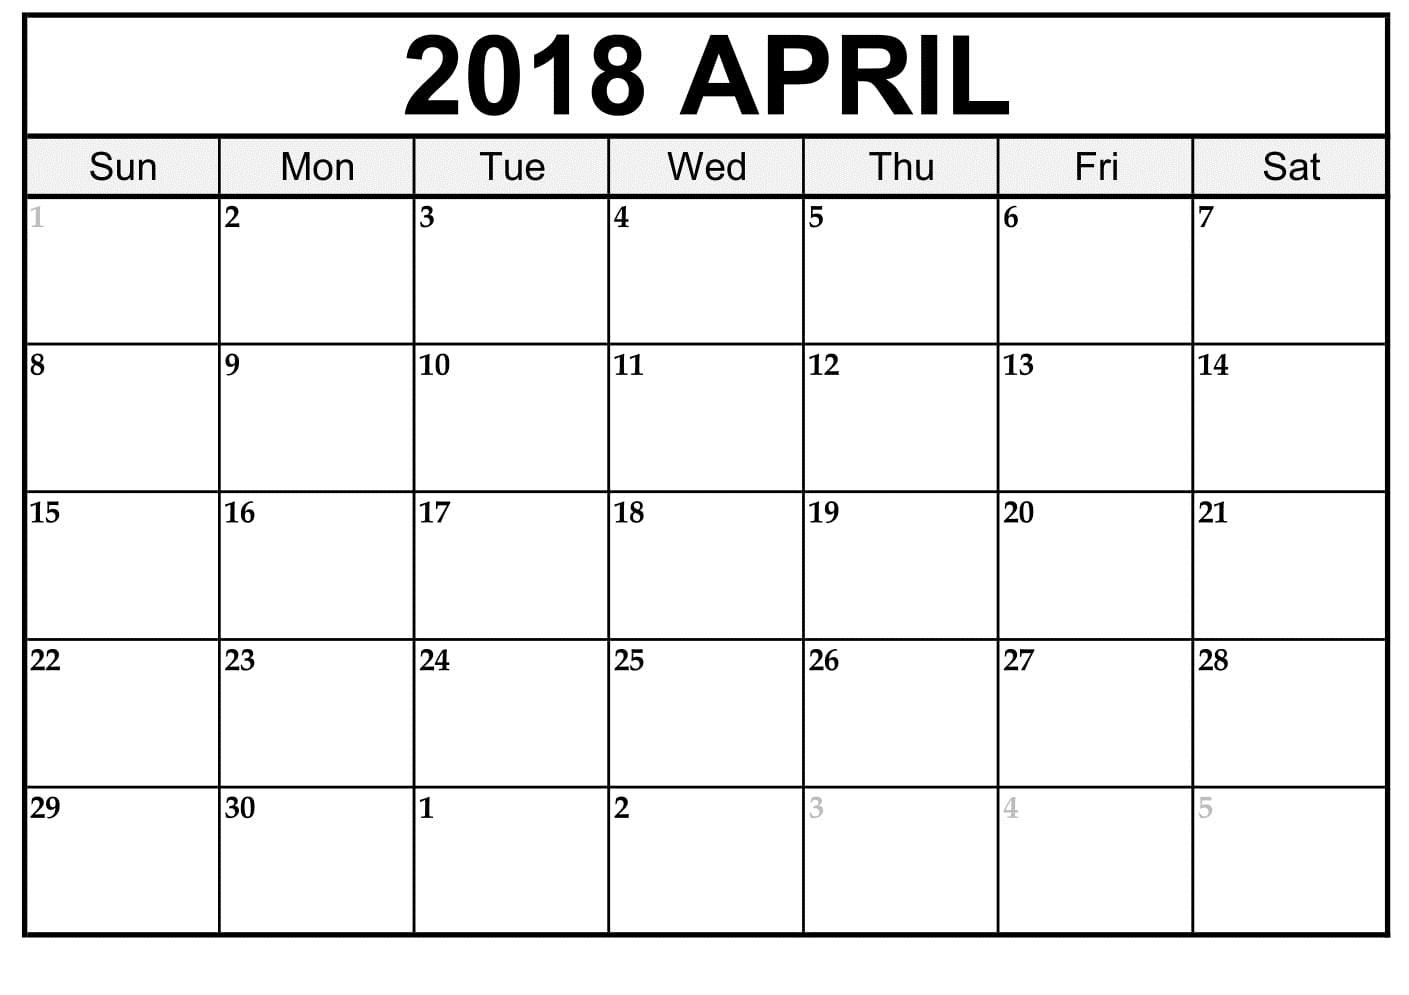 April 2018 Calendar Word Document Printable  Xjb